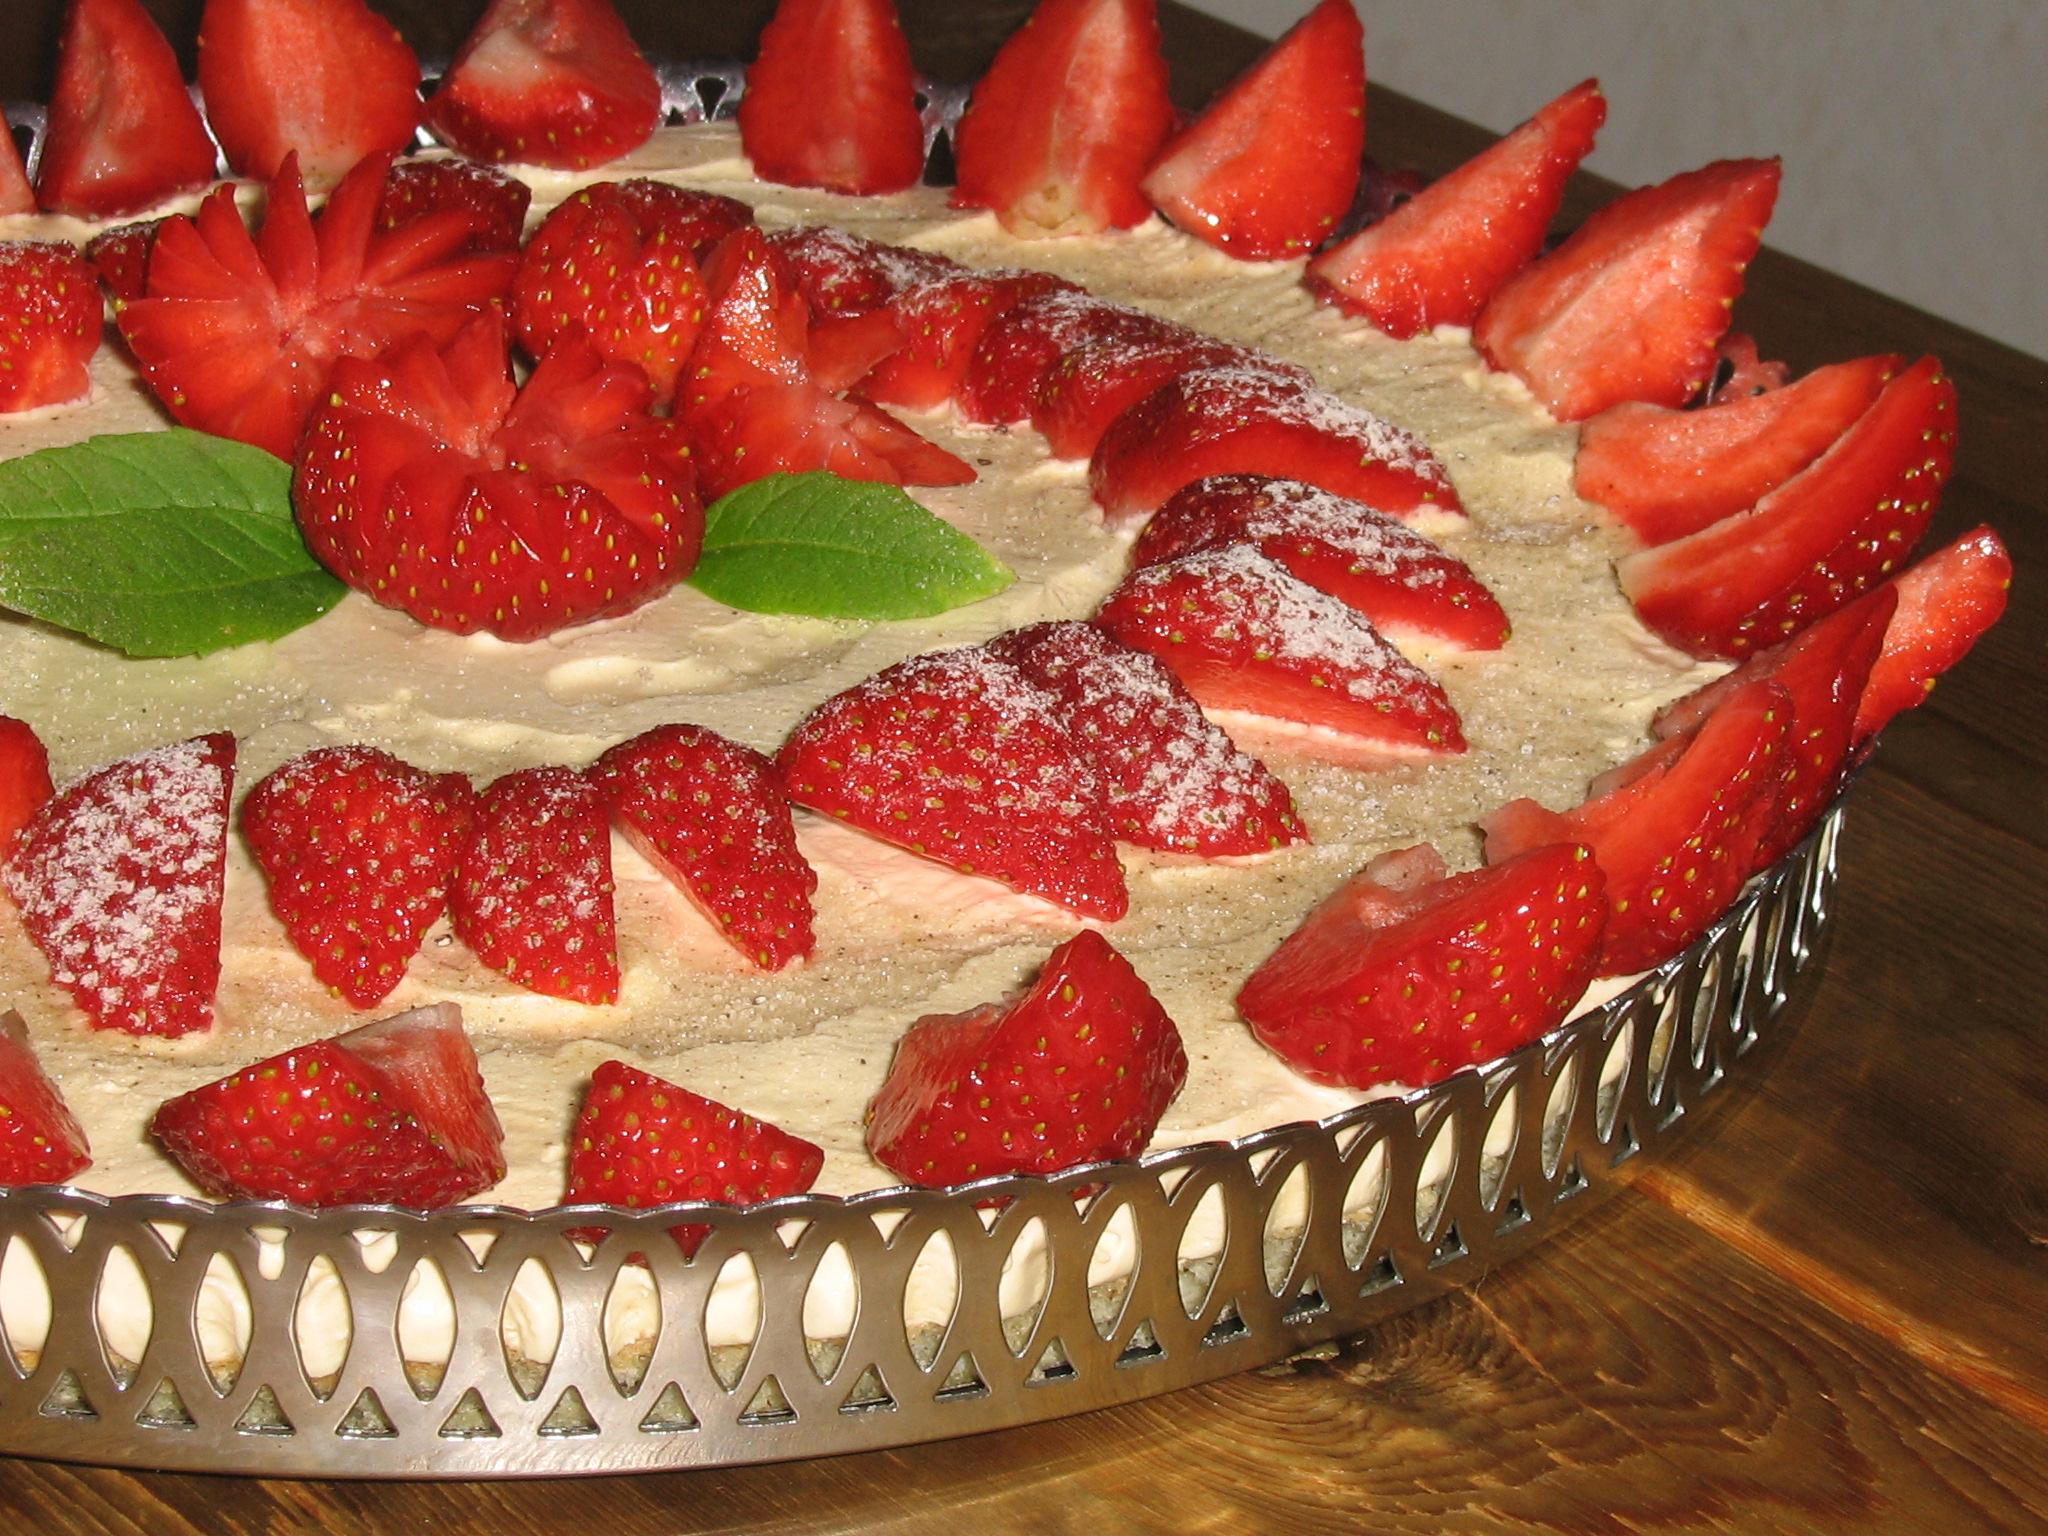 Vaniljparfait-tårta med jordgubbar